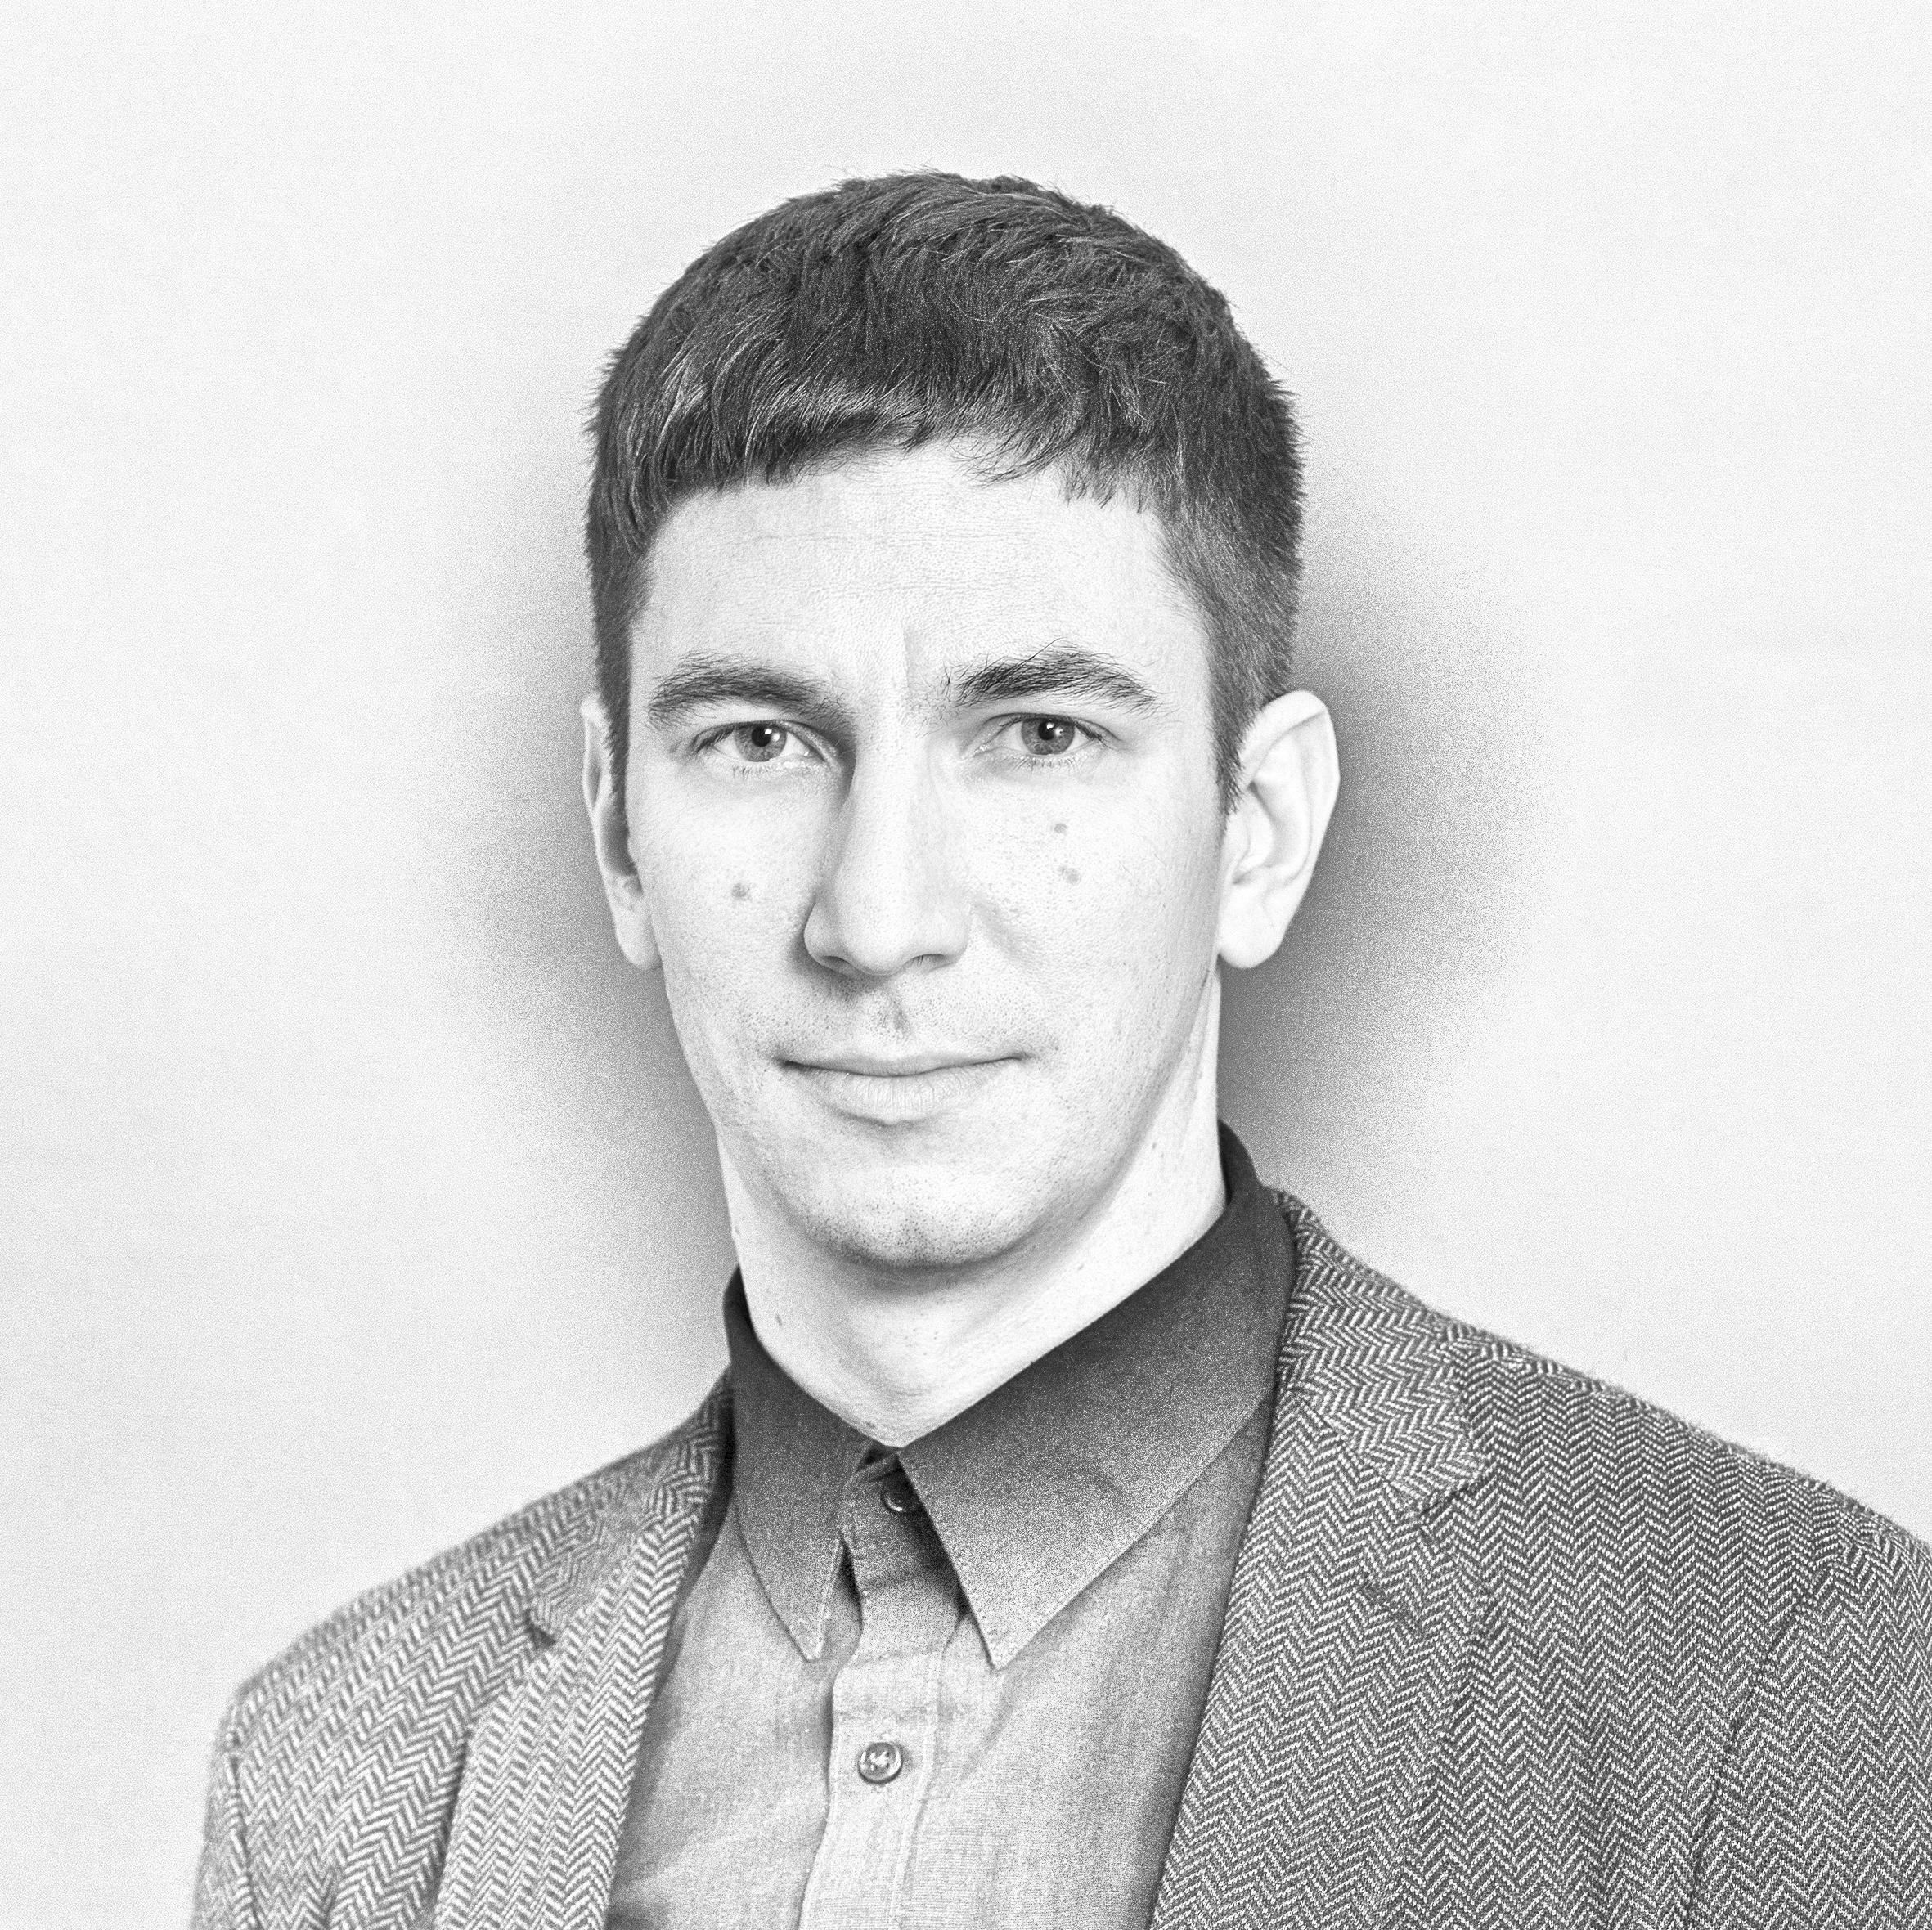 Benjamin Opratko